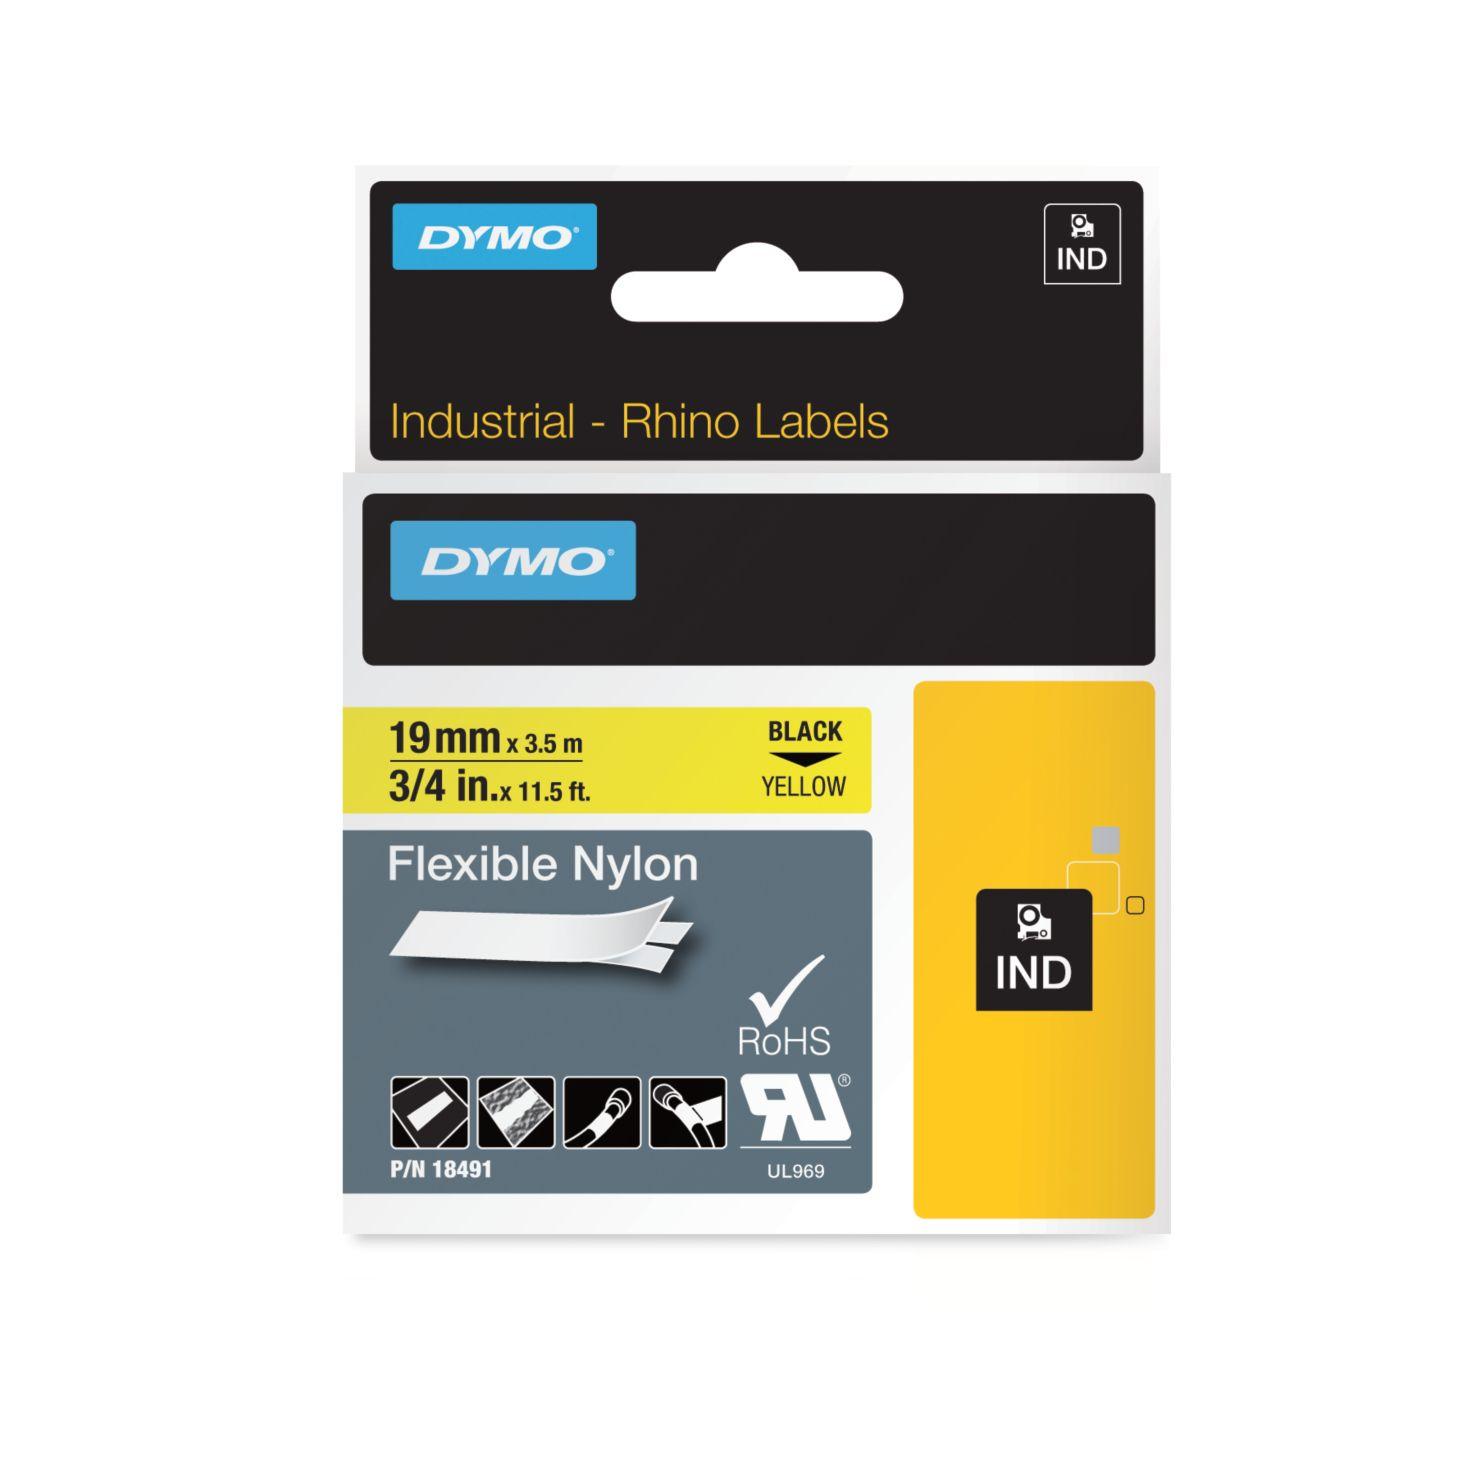 Dymo Rhino-Schriftband Nylon 19mm x 3,5m schwarz auf gelb